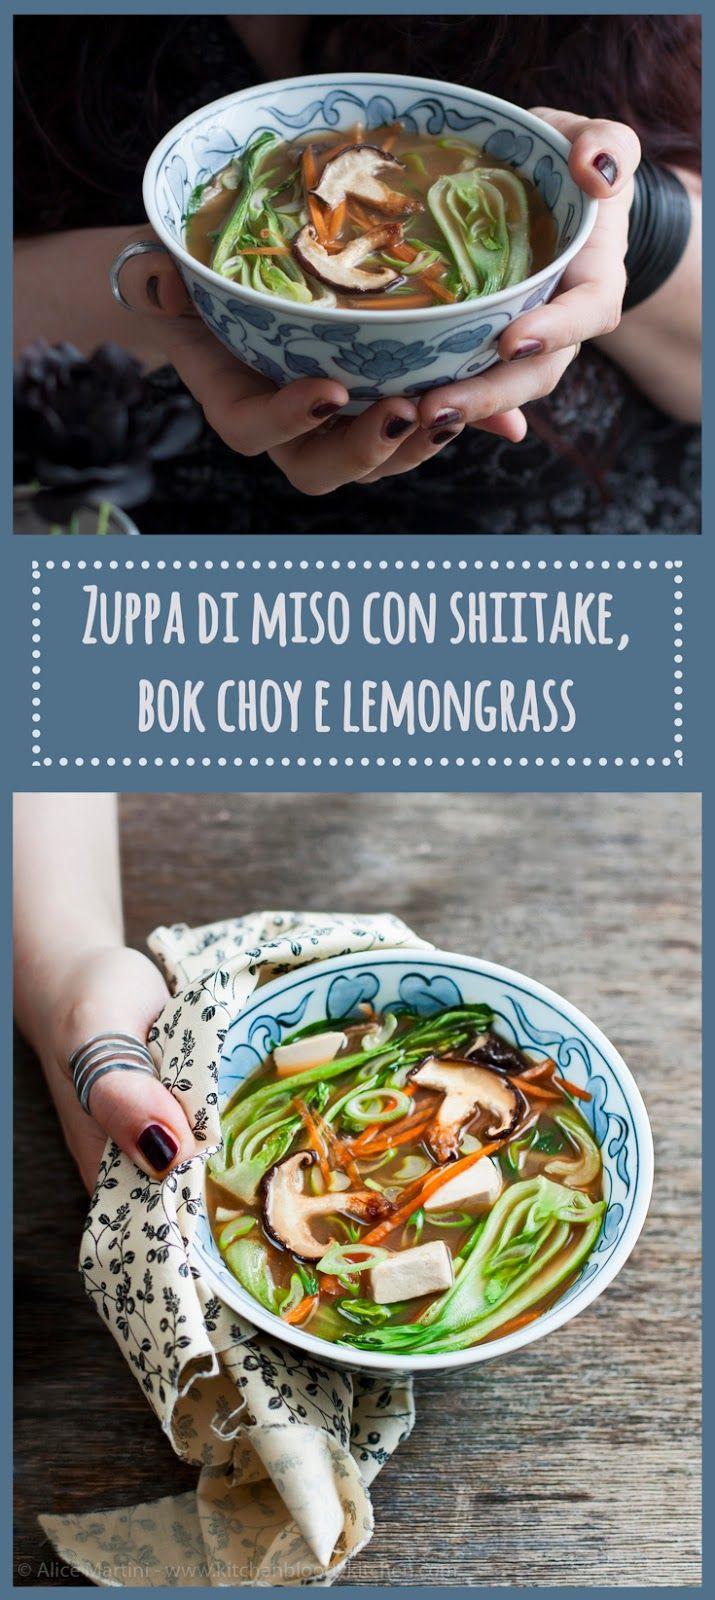 Miso soup with shiitake, bok choy and lemongrass | *Vegan recipe*